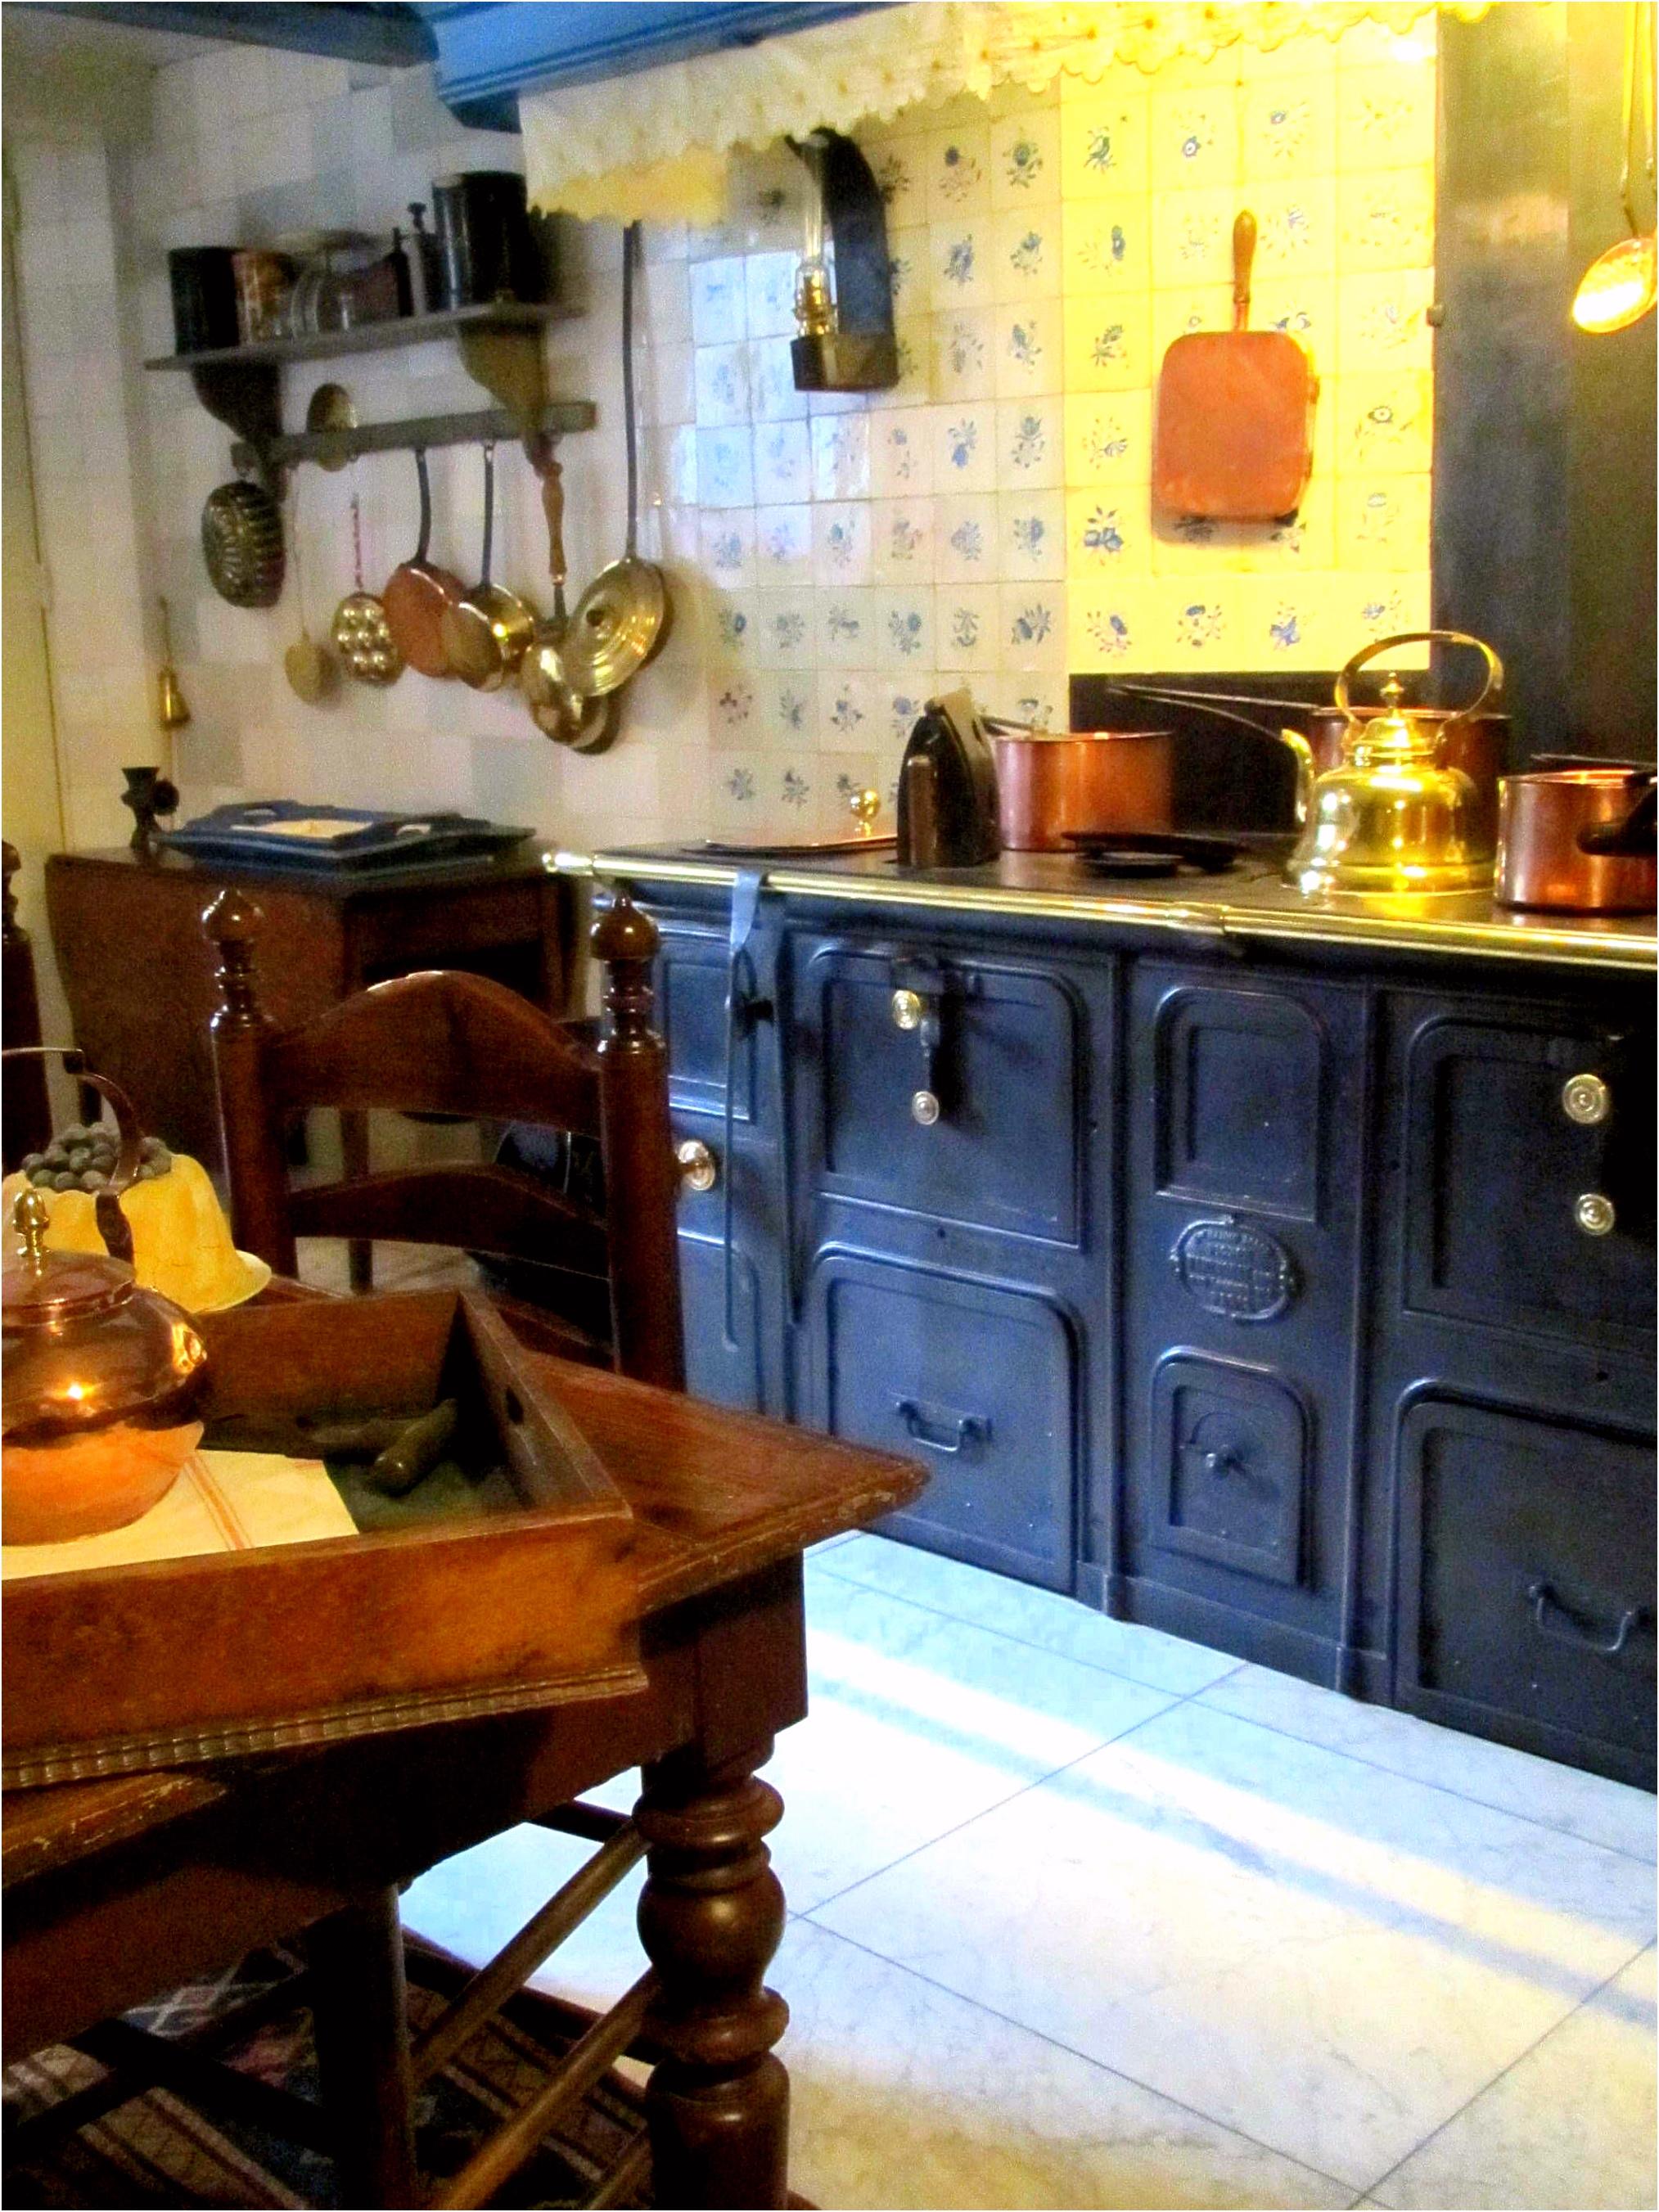 Dutch kitchen interior c 1750 museum van Loon Amsterdam the